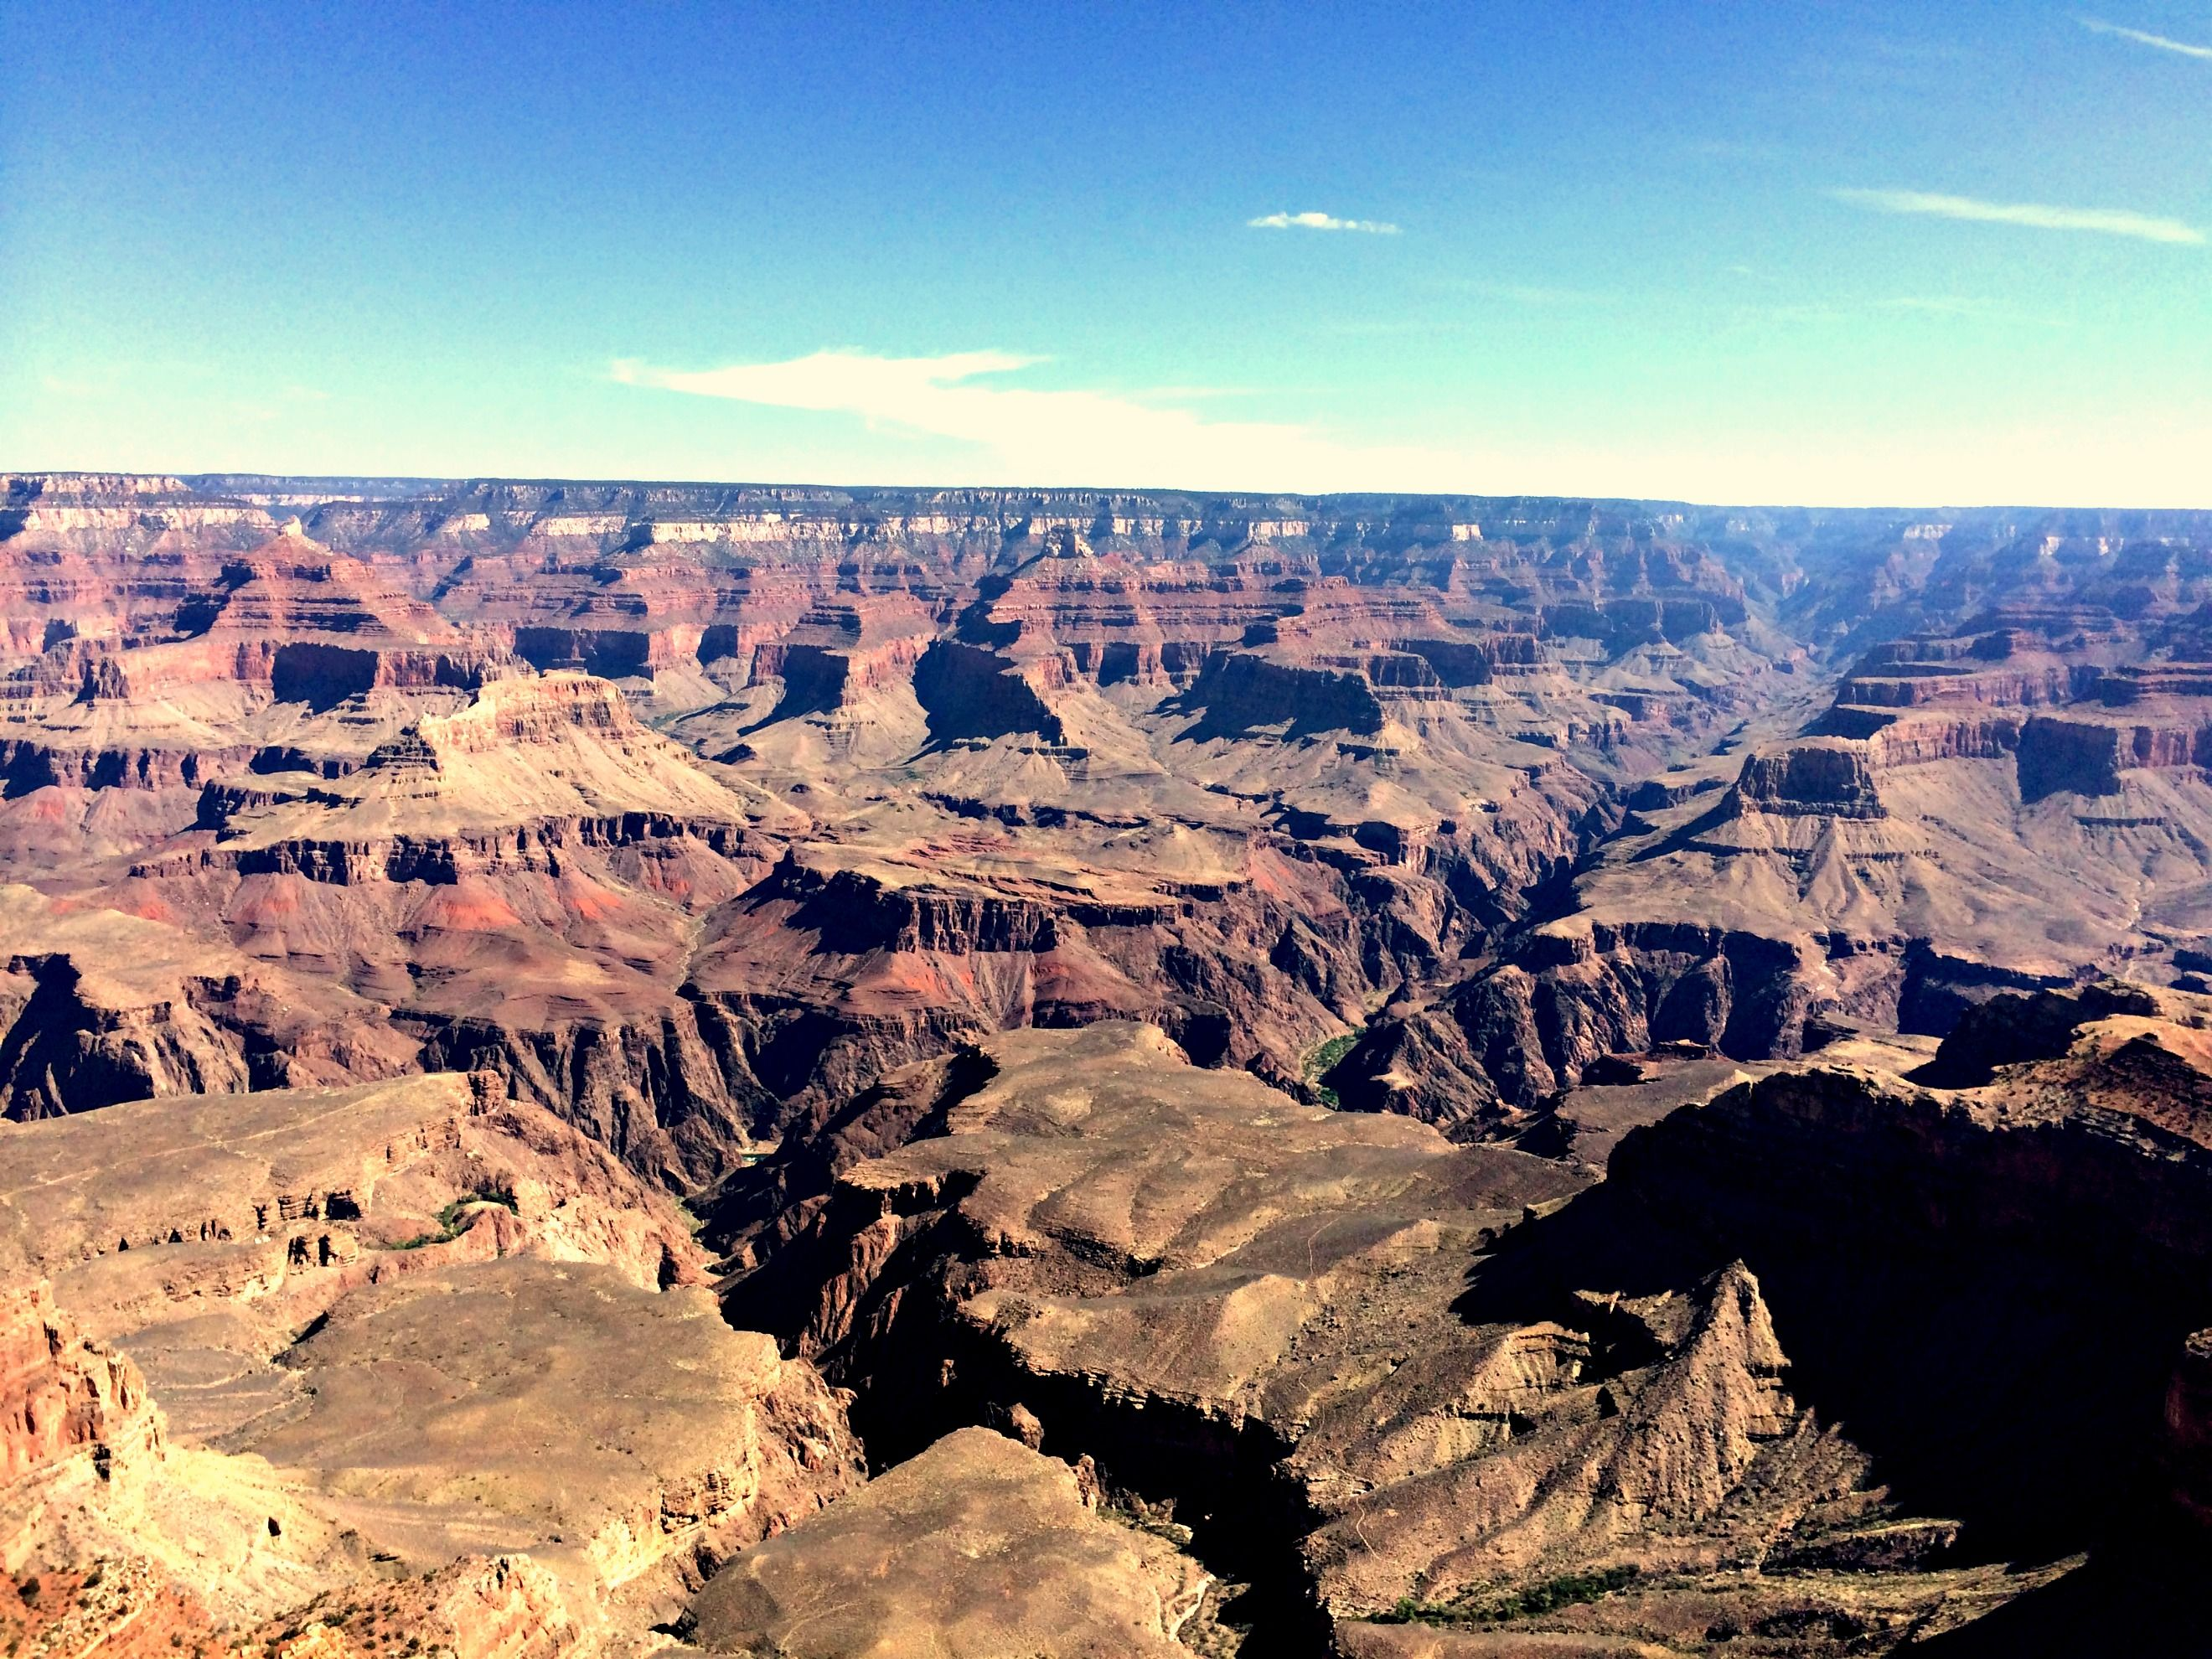 3 Day Grand Canyon South Rim Las Vegas Tour From Los Angeles Grand Canyon South Grand Canyon Tours Grand Canyon South Rim